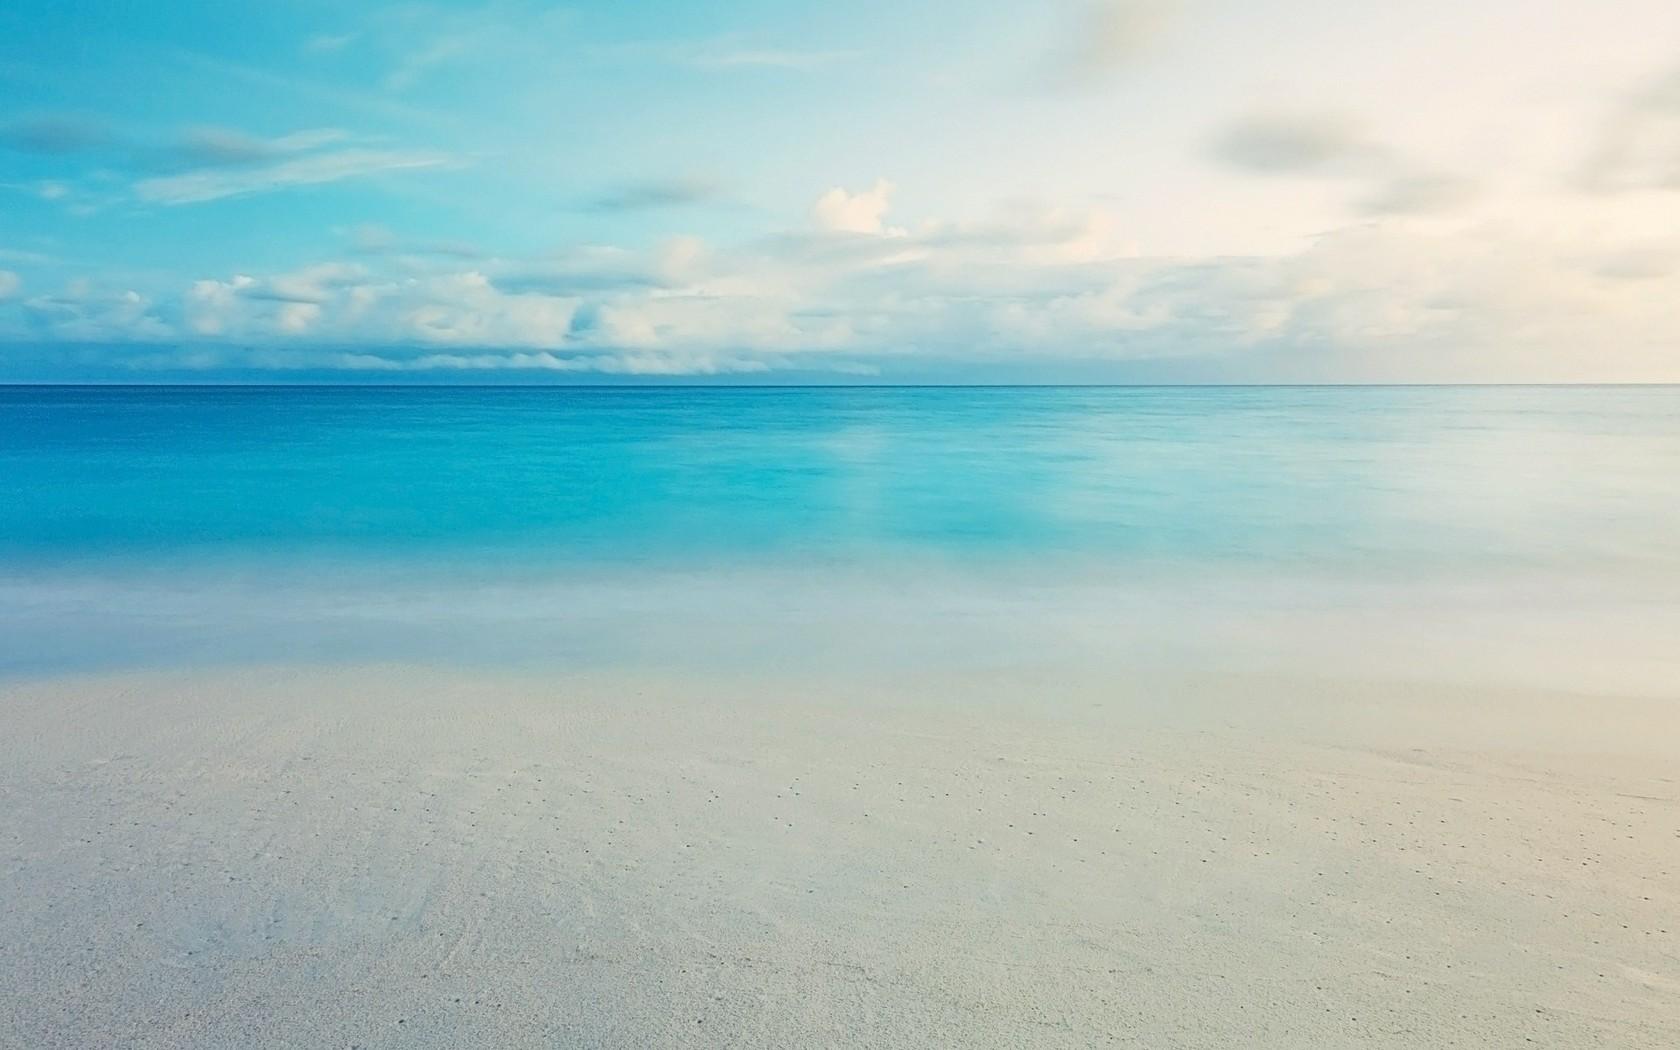 Calm blue ocean wallpaper 14485 1680x1050